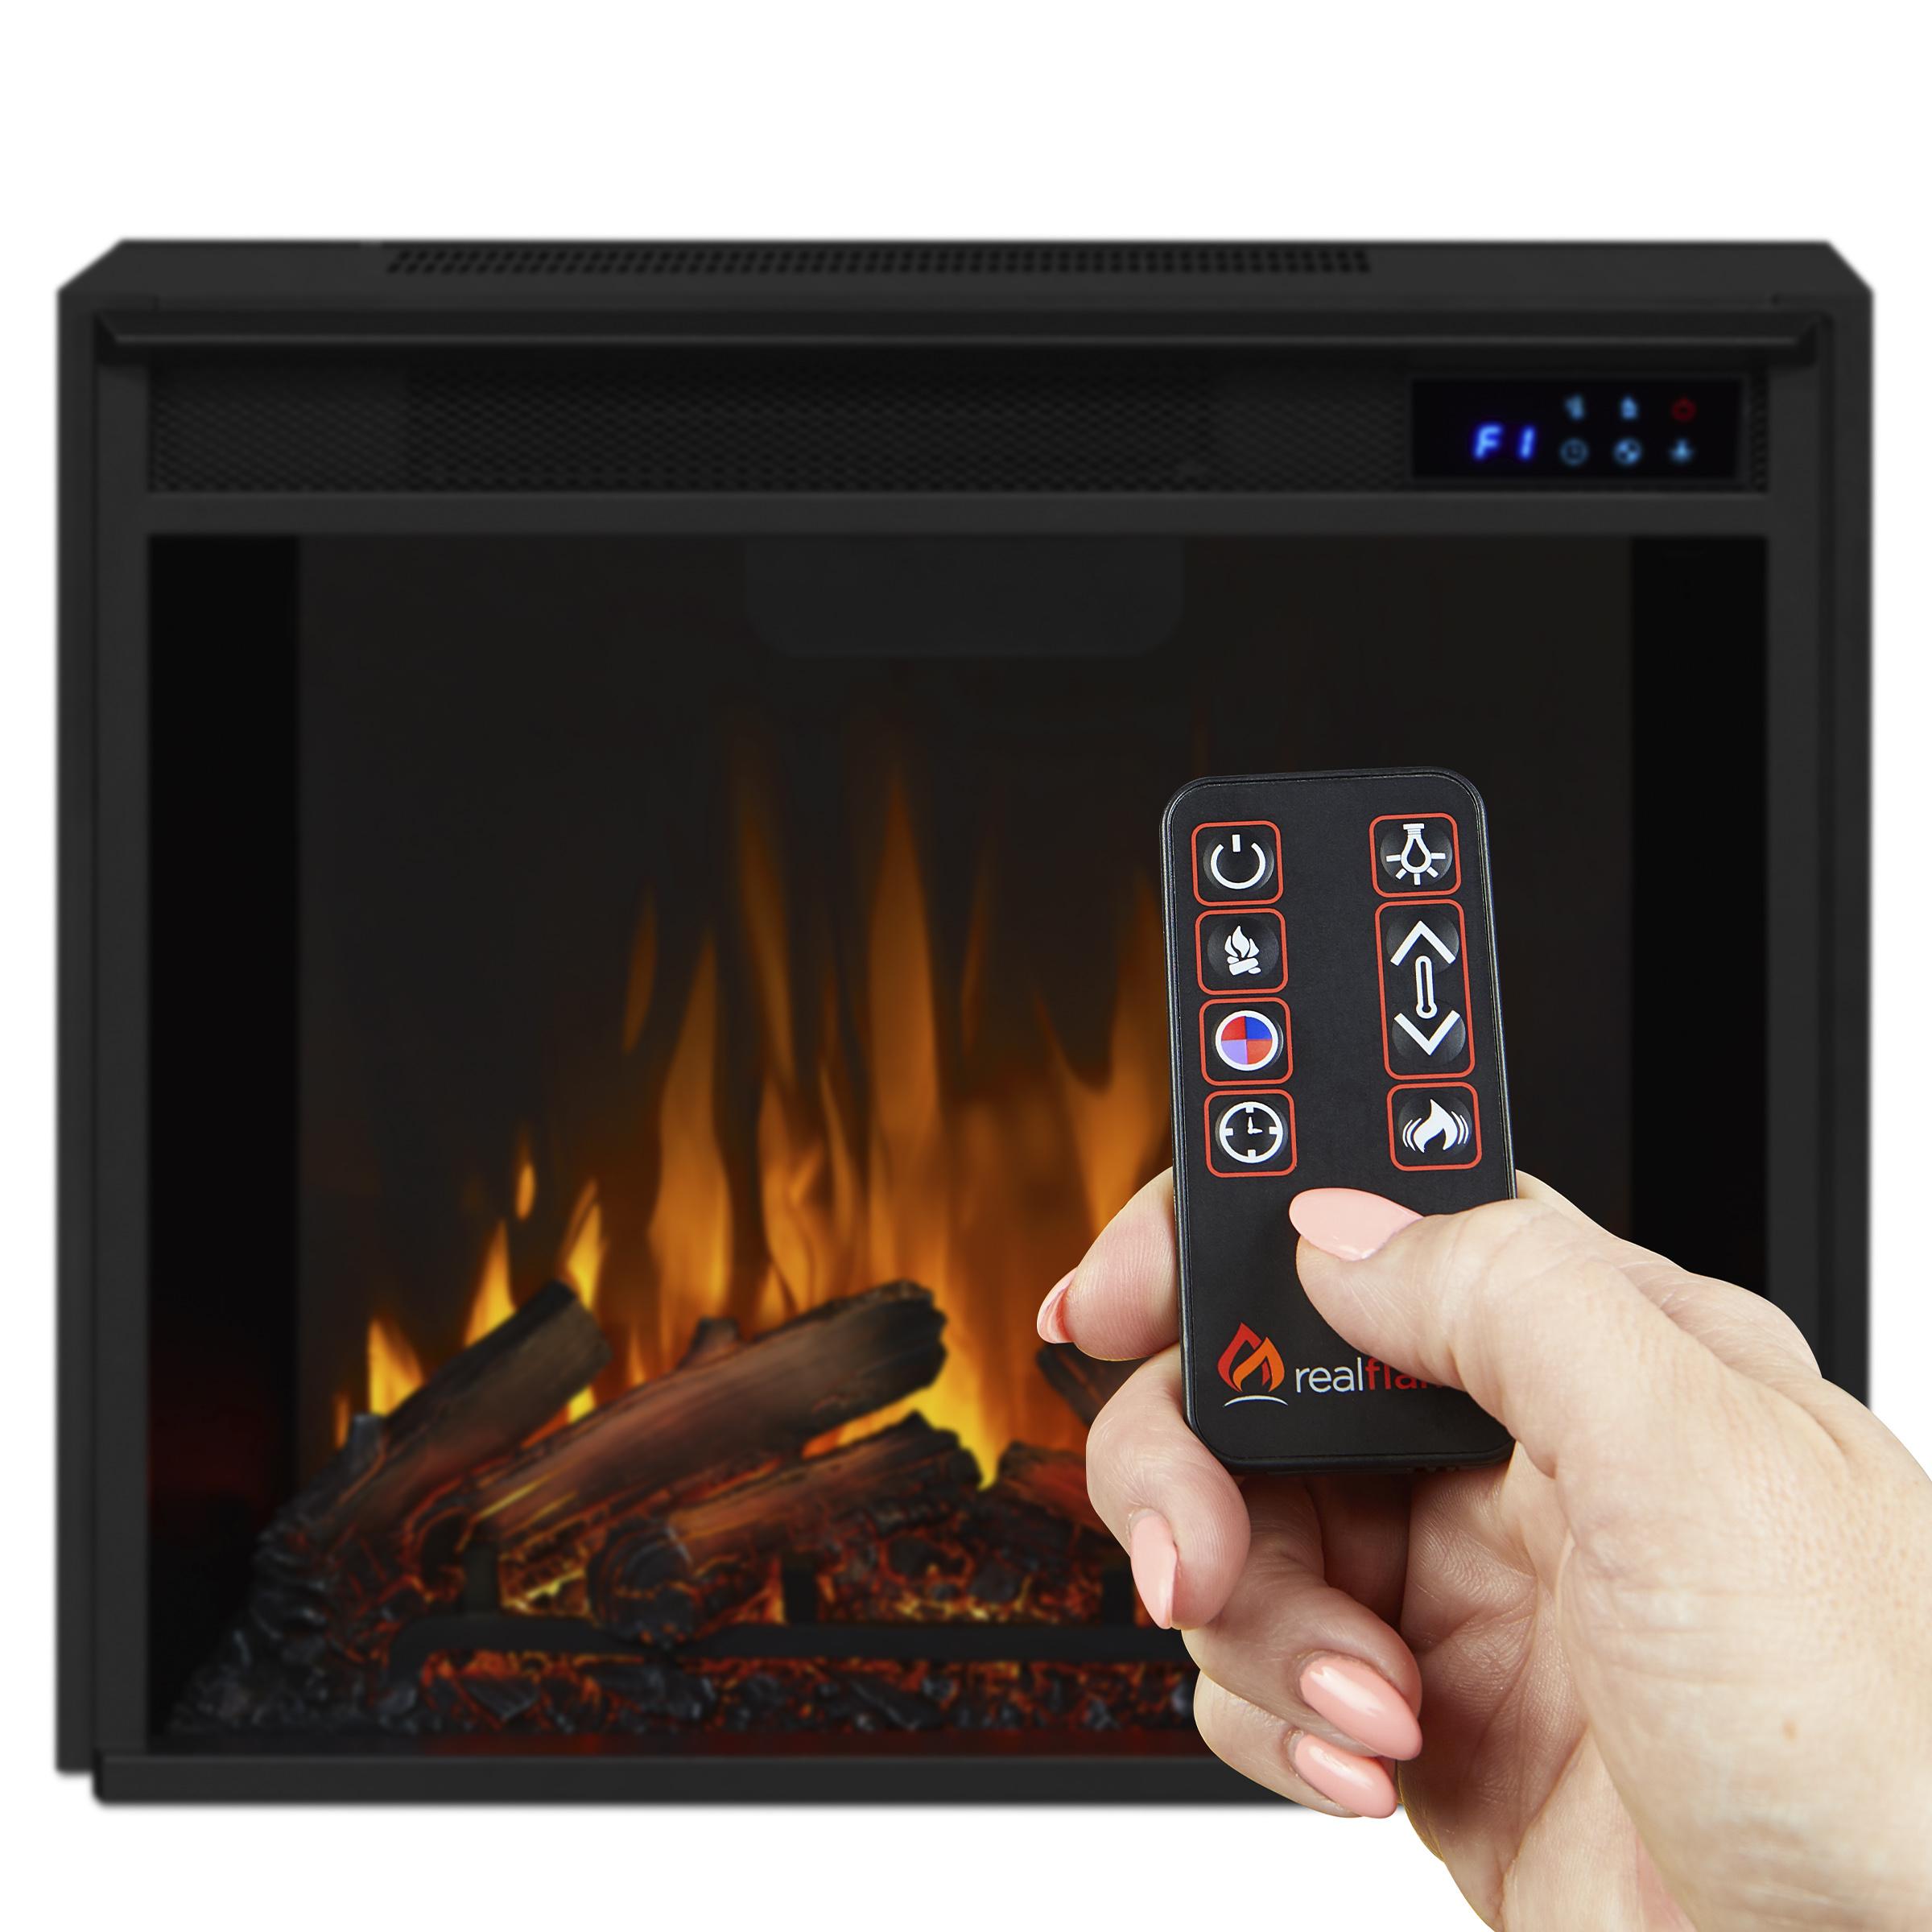 4199 Firebox Remote Control Demonstration